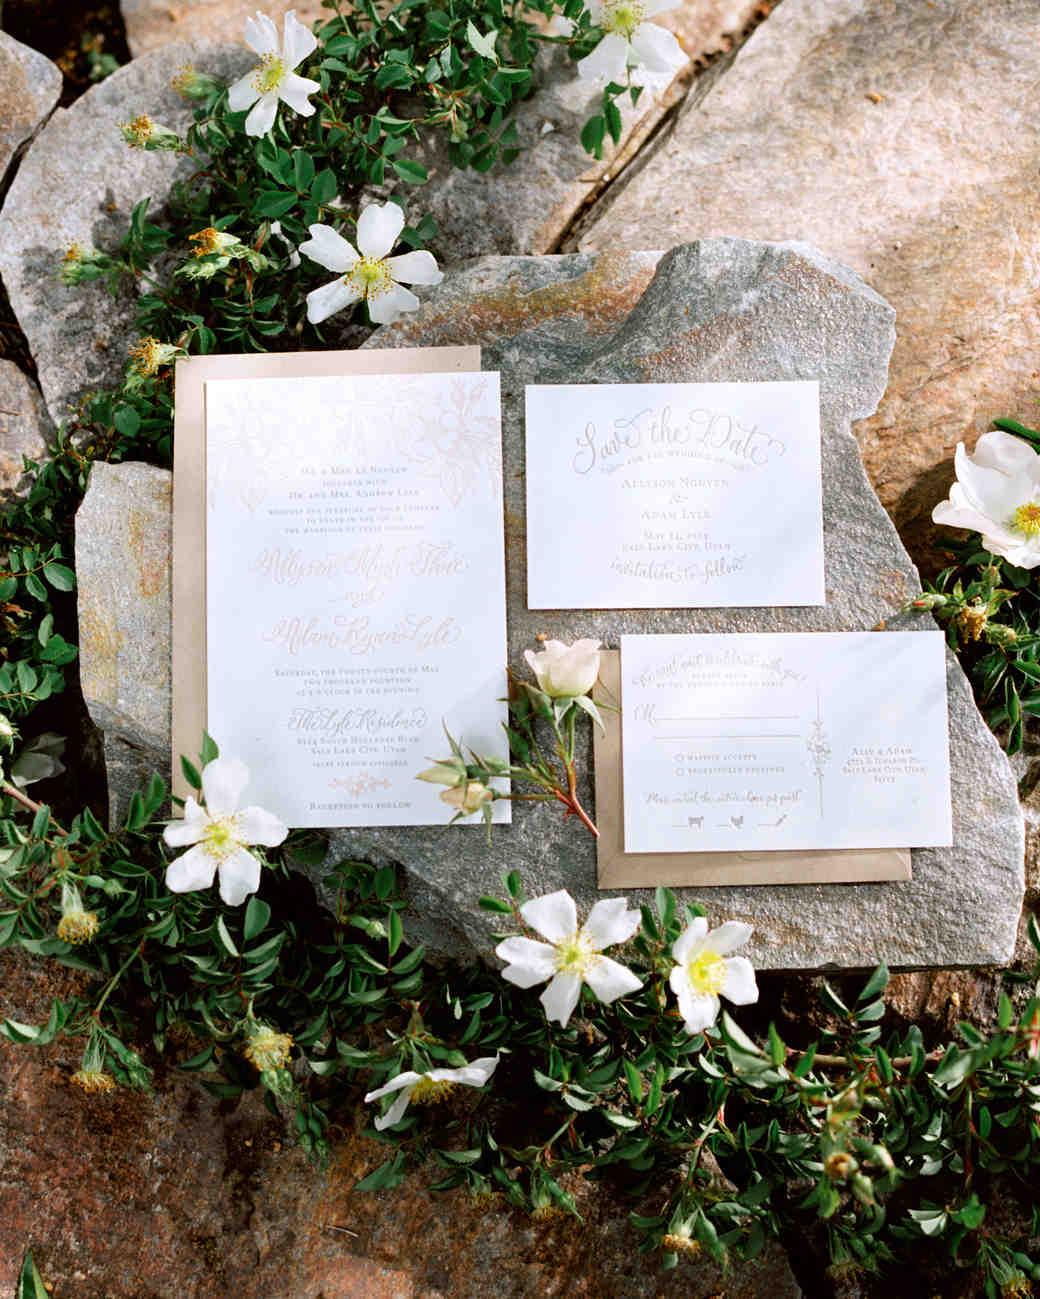 ally-adam-wedding-invite-029-s111818-0215.jpg